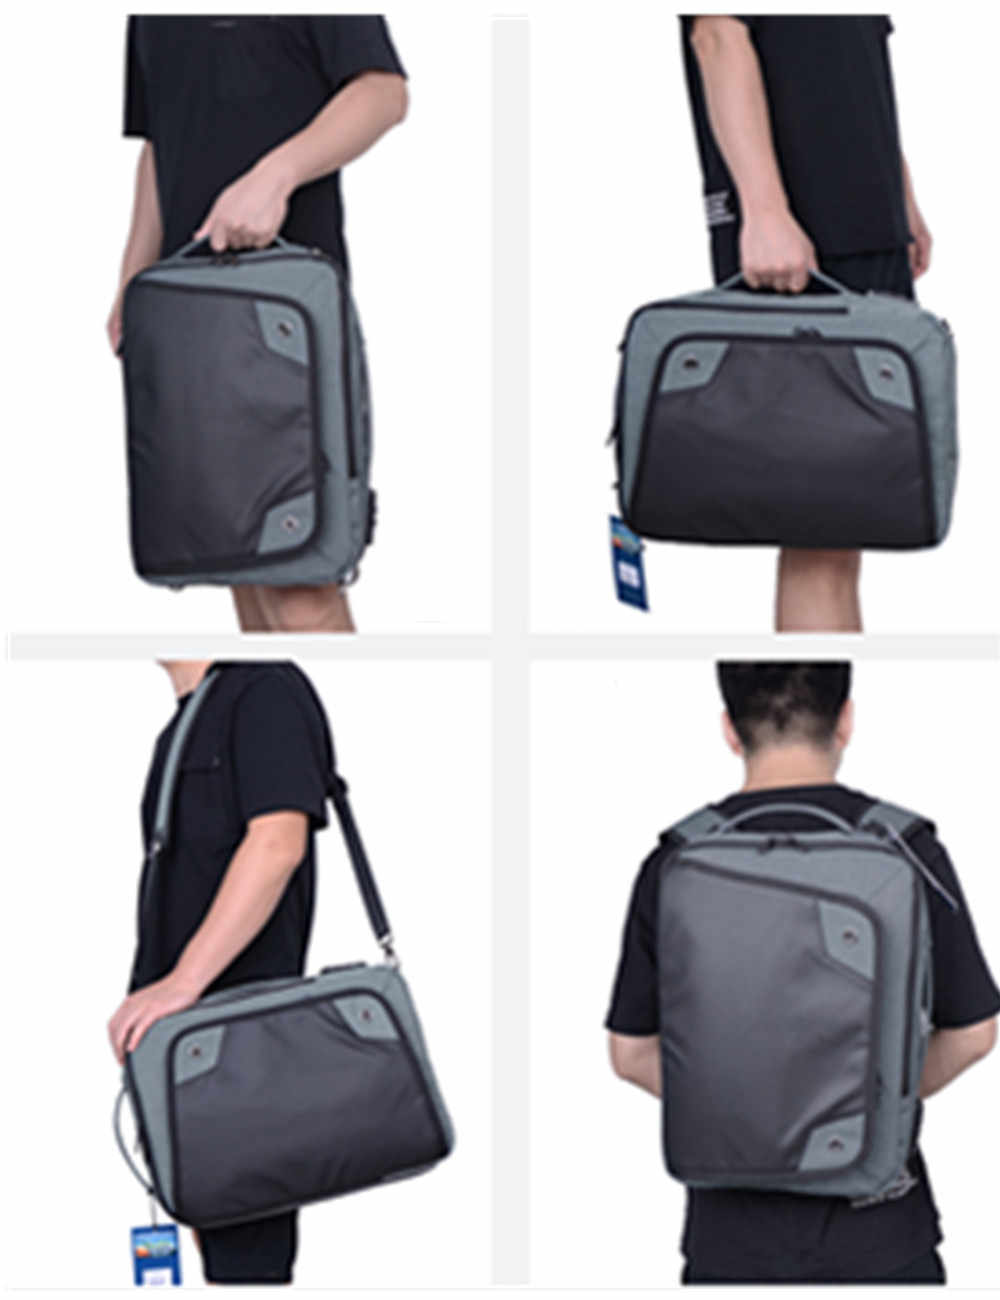 New Backpack Waterproof Casual Shoulder Bag Multi-function Travel Bag Password Lock Anti-theft Backpack